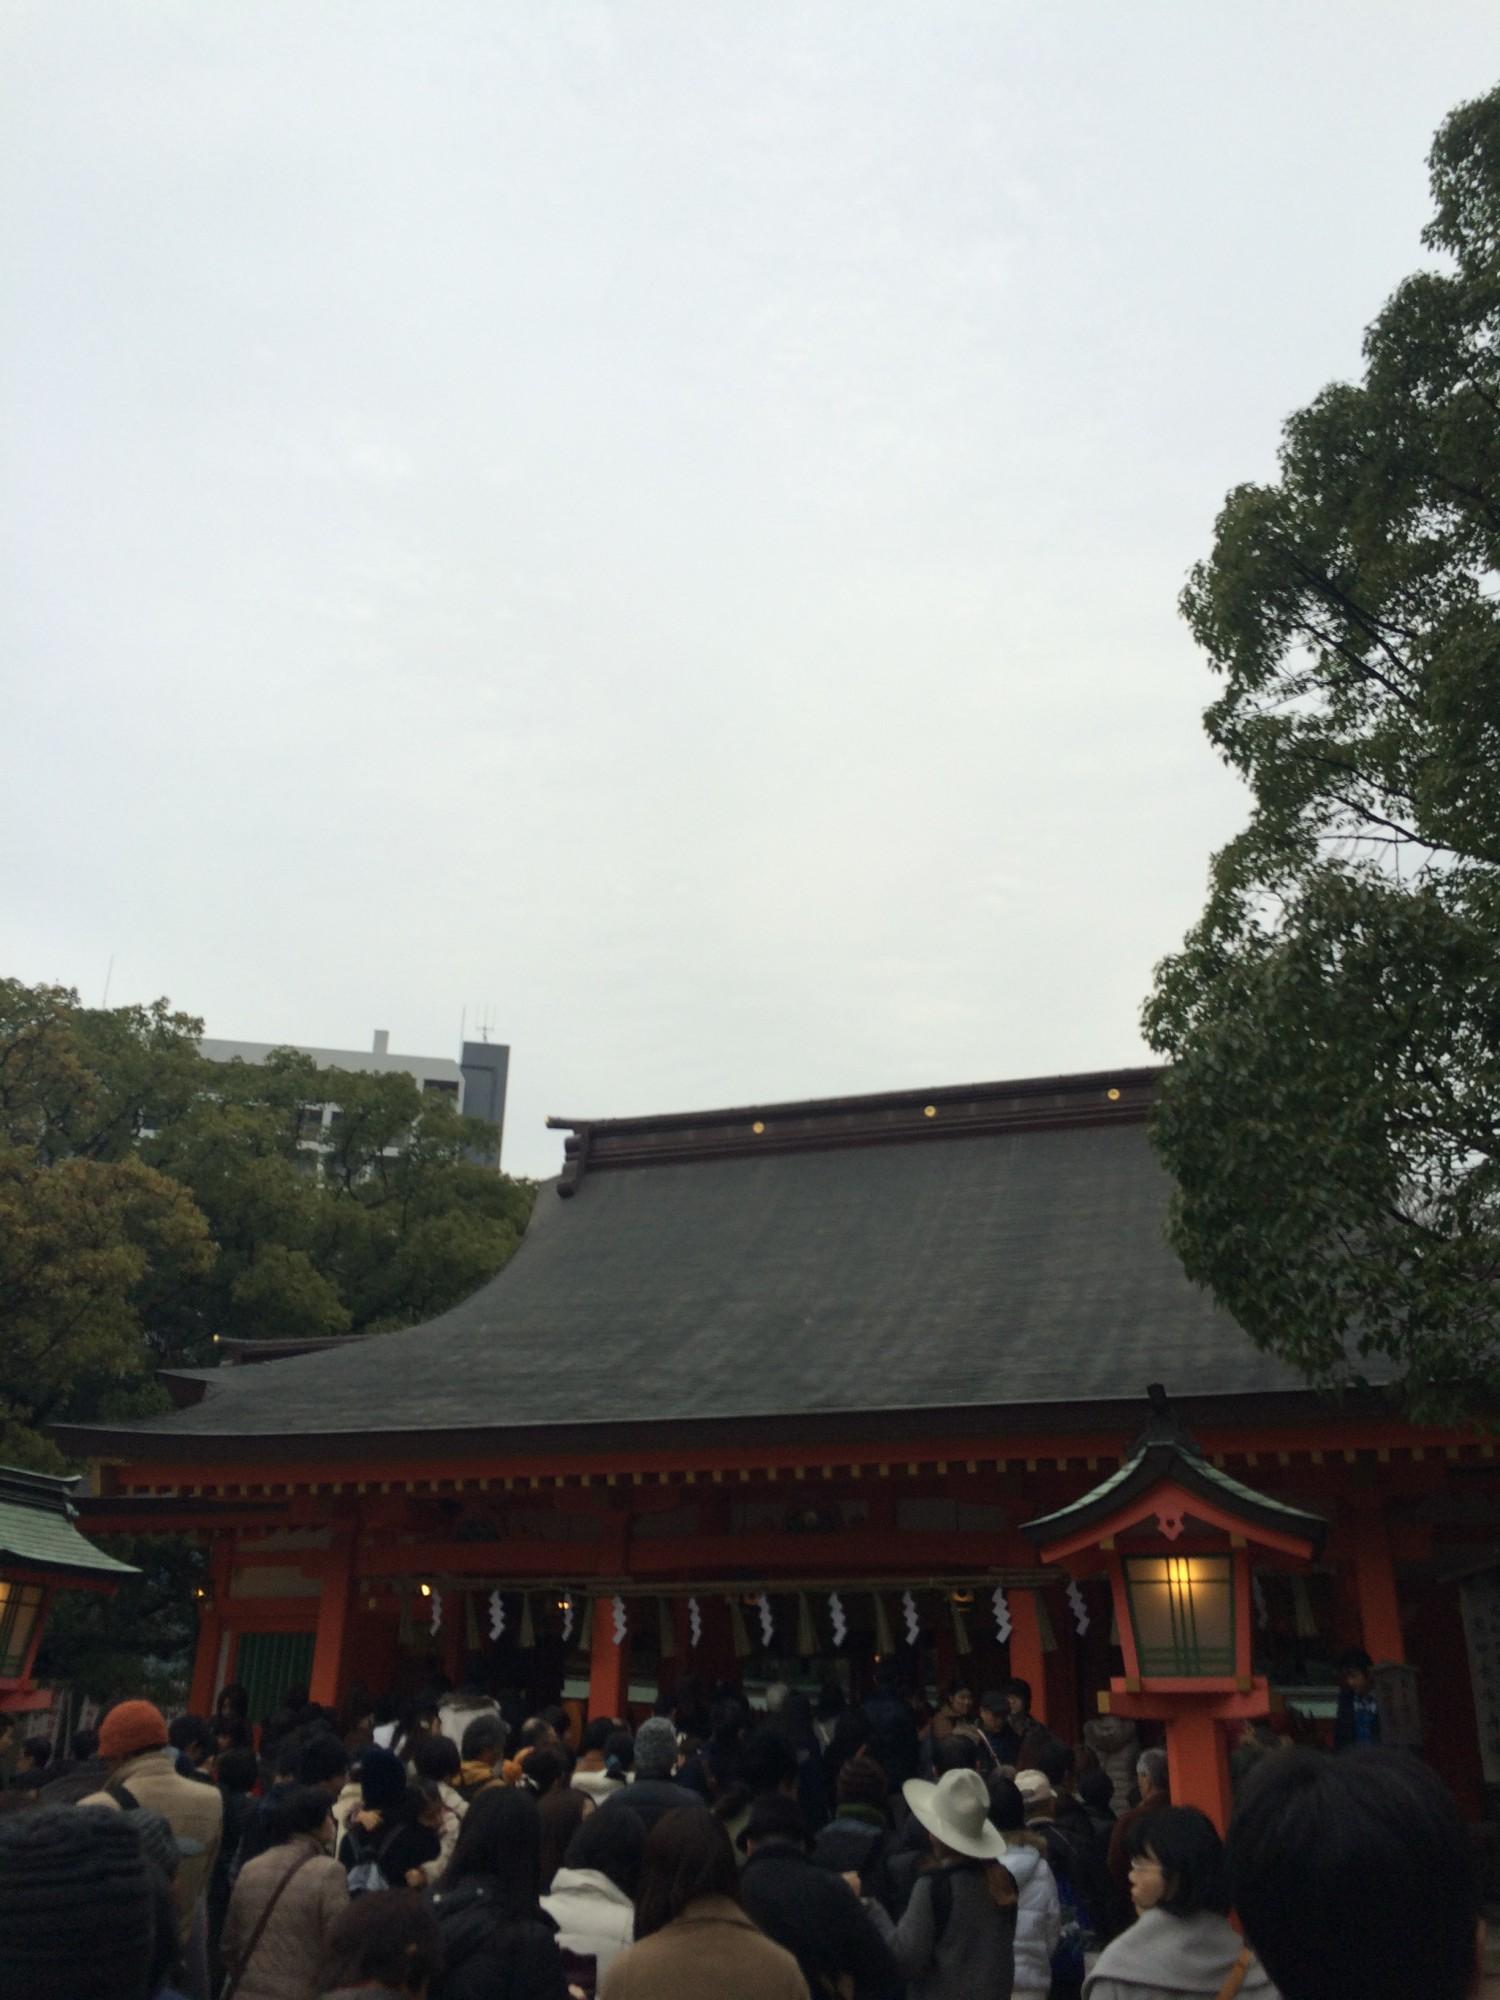 住吉神社(福岡市)の駐車場